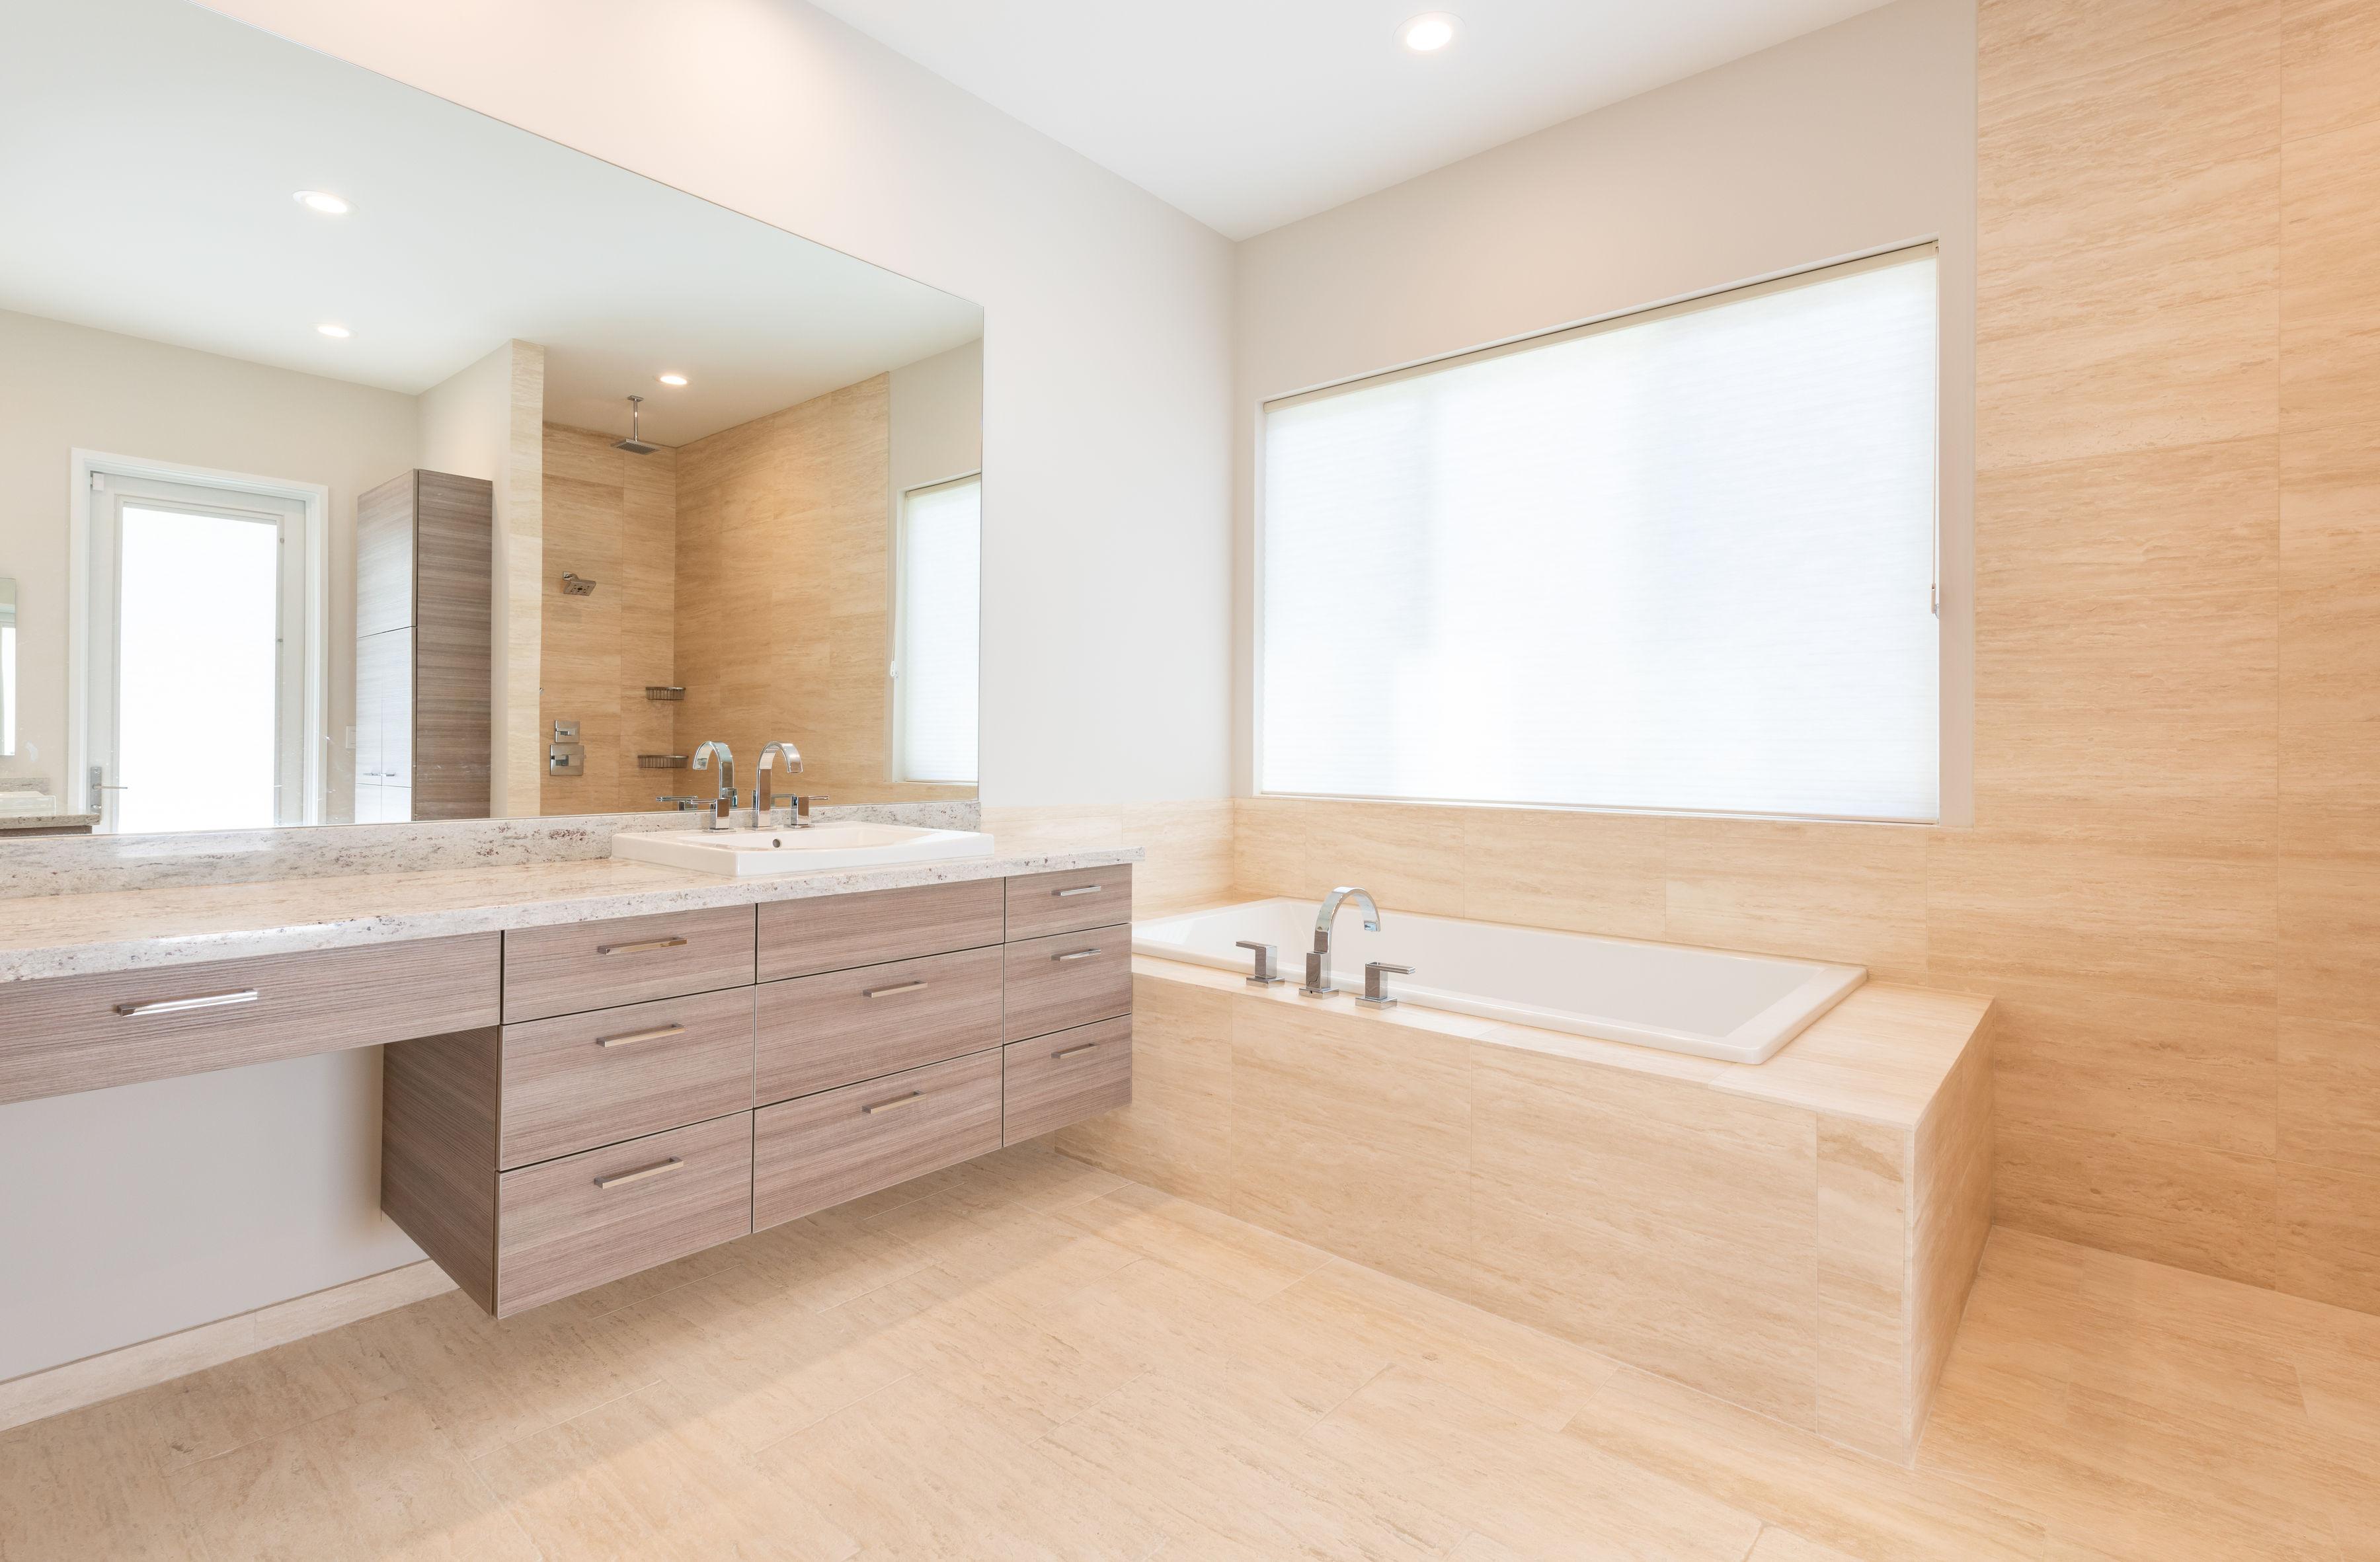 14-luxury-bathtub